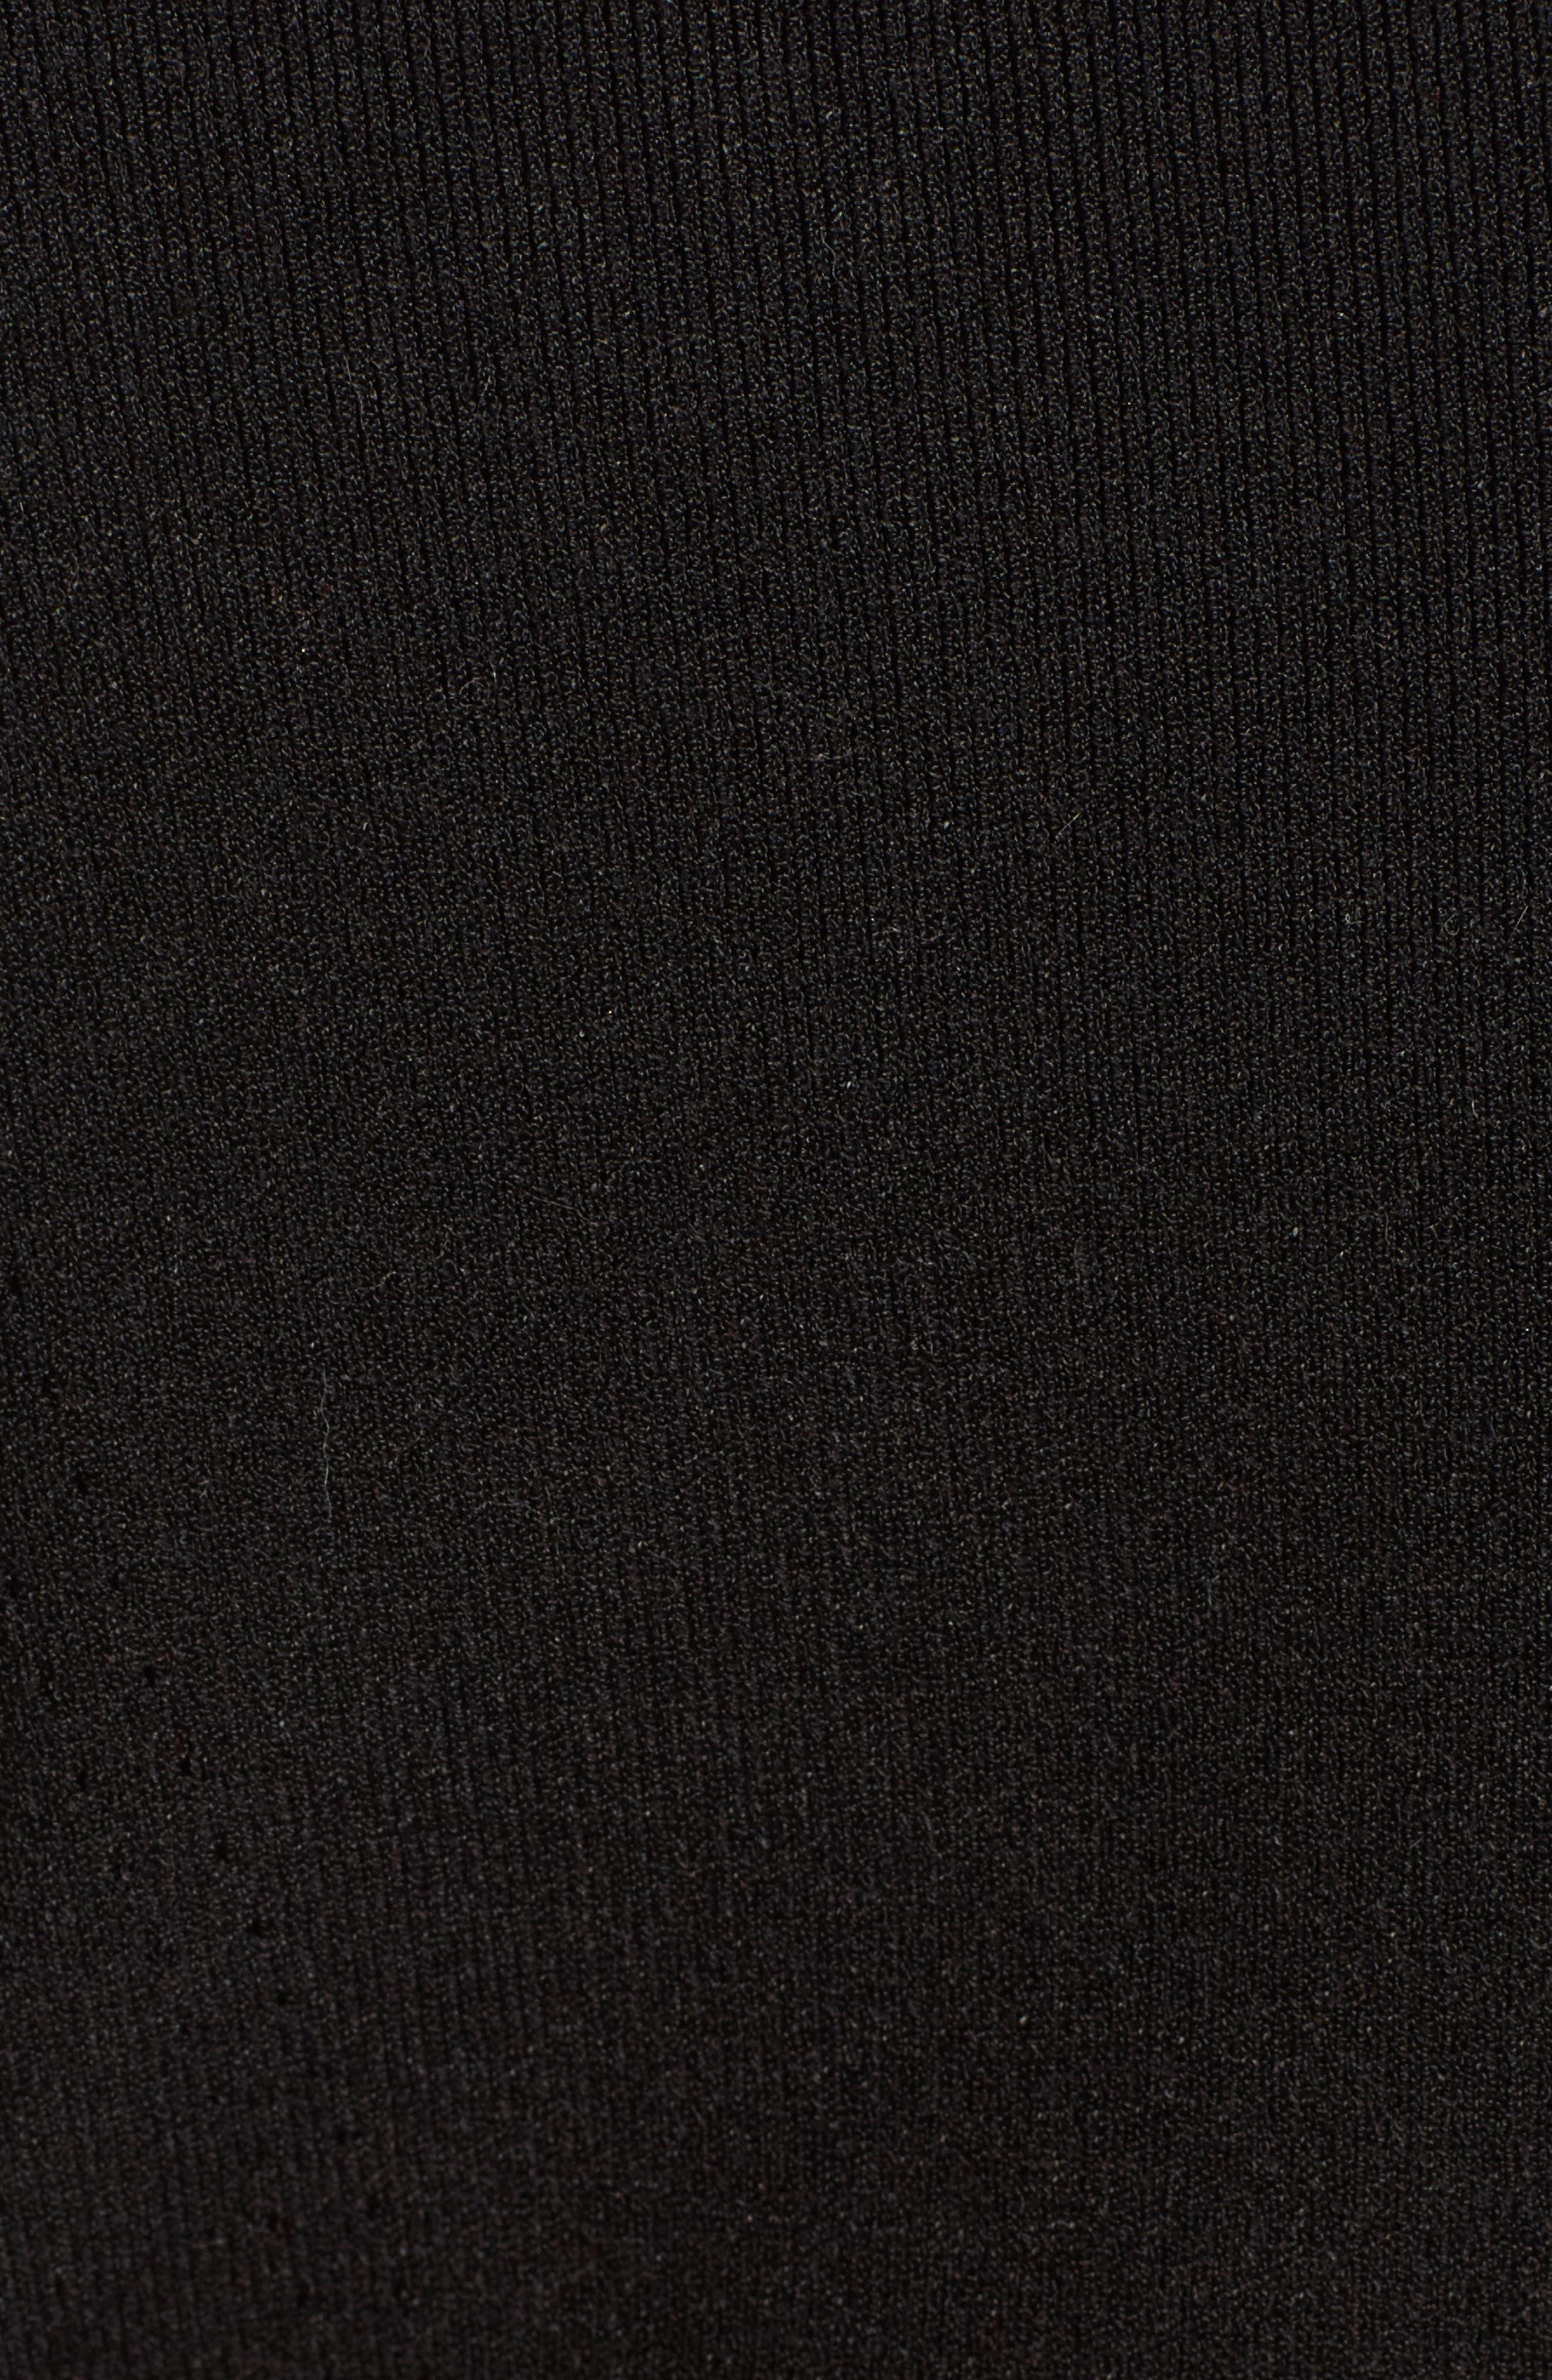 Alternate Image 3  - Fendi Macramé Inset Knit Dress